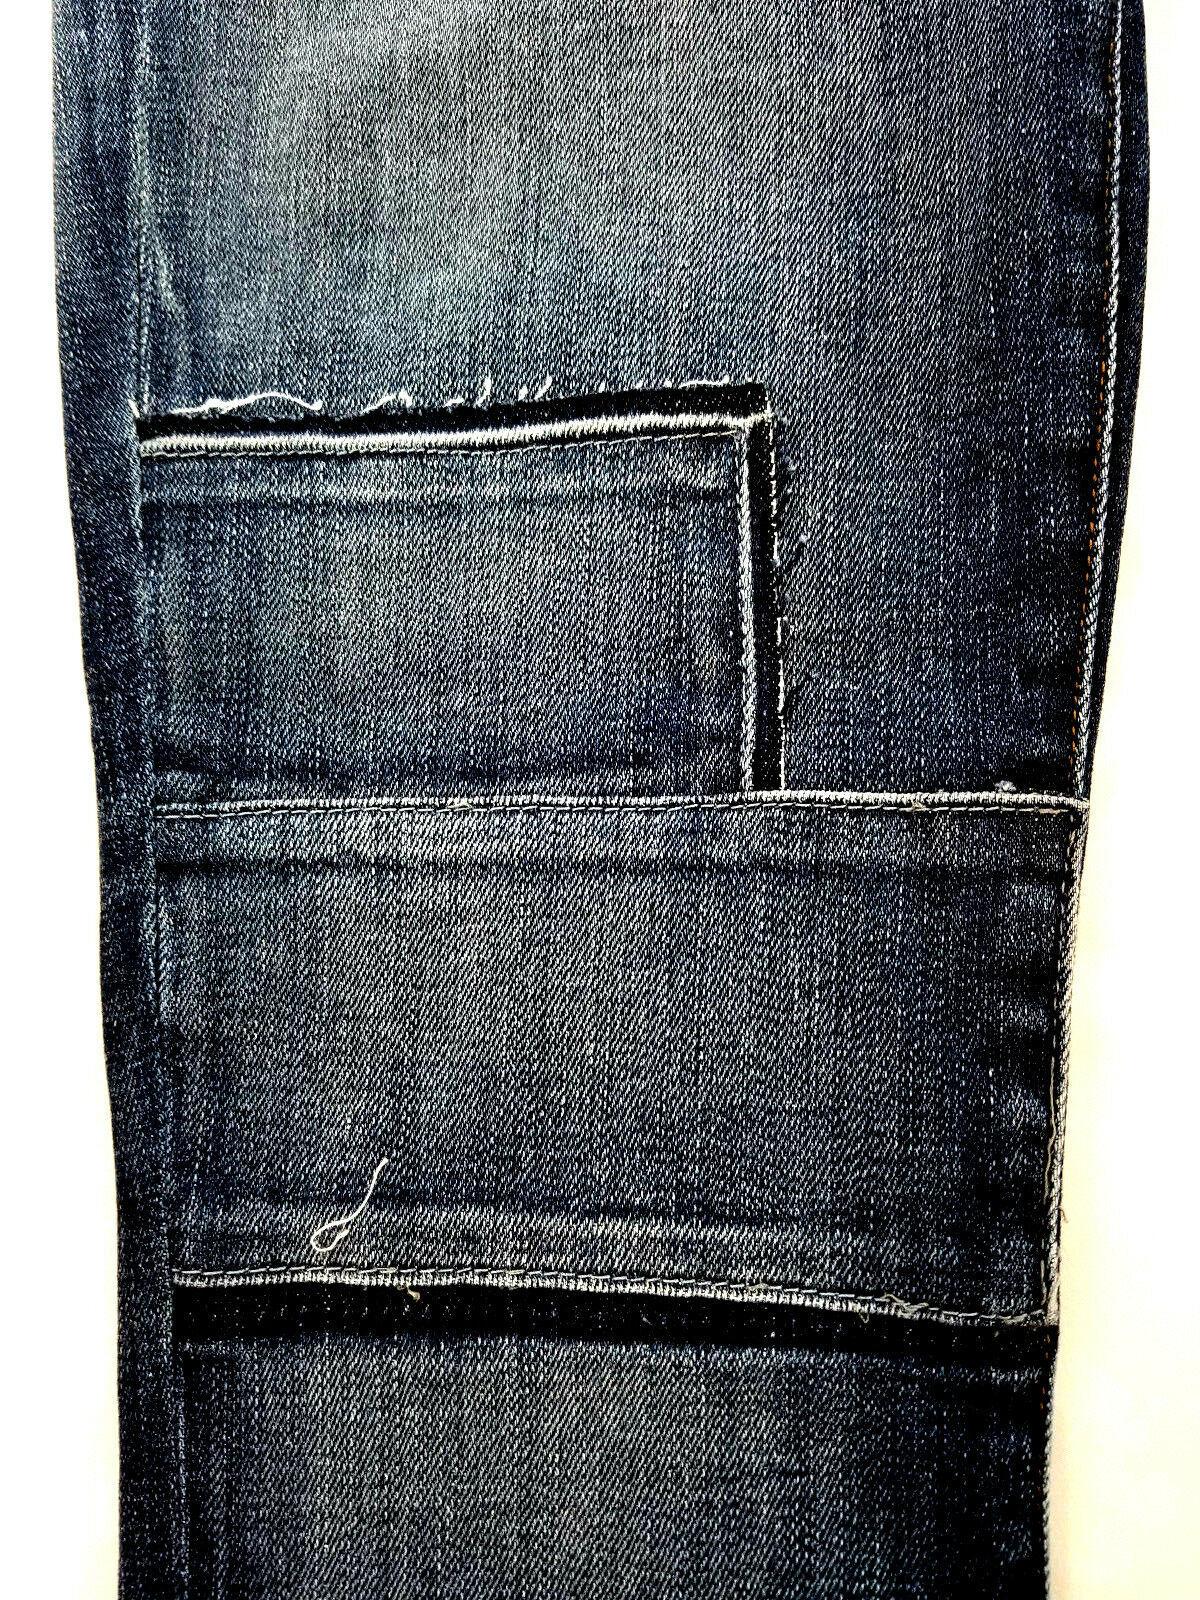 new J BRAND women jeans Jasper Patched JB001098 high rise crop 26 blue MSRP $298 image 7